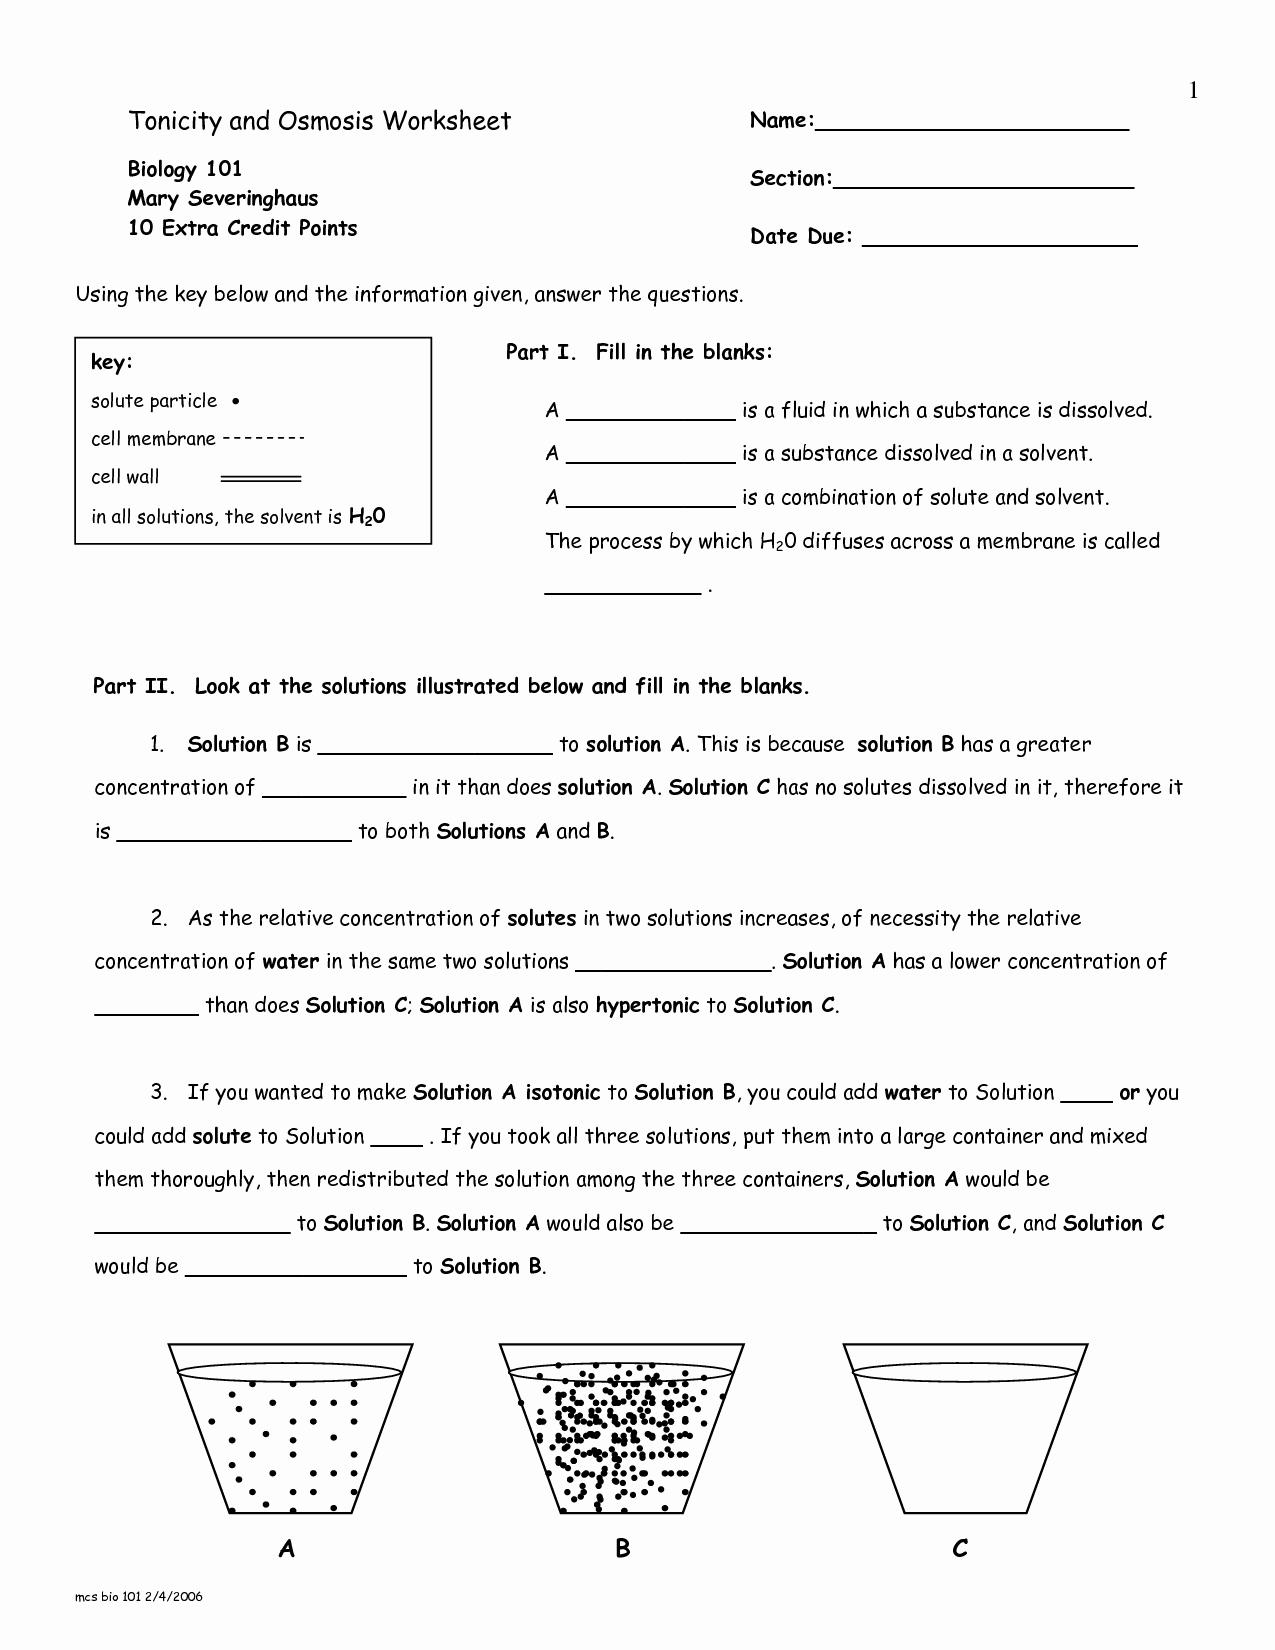 50 Osmosis Jones Video Worksheet Answers